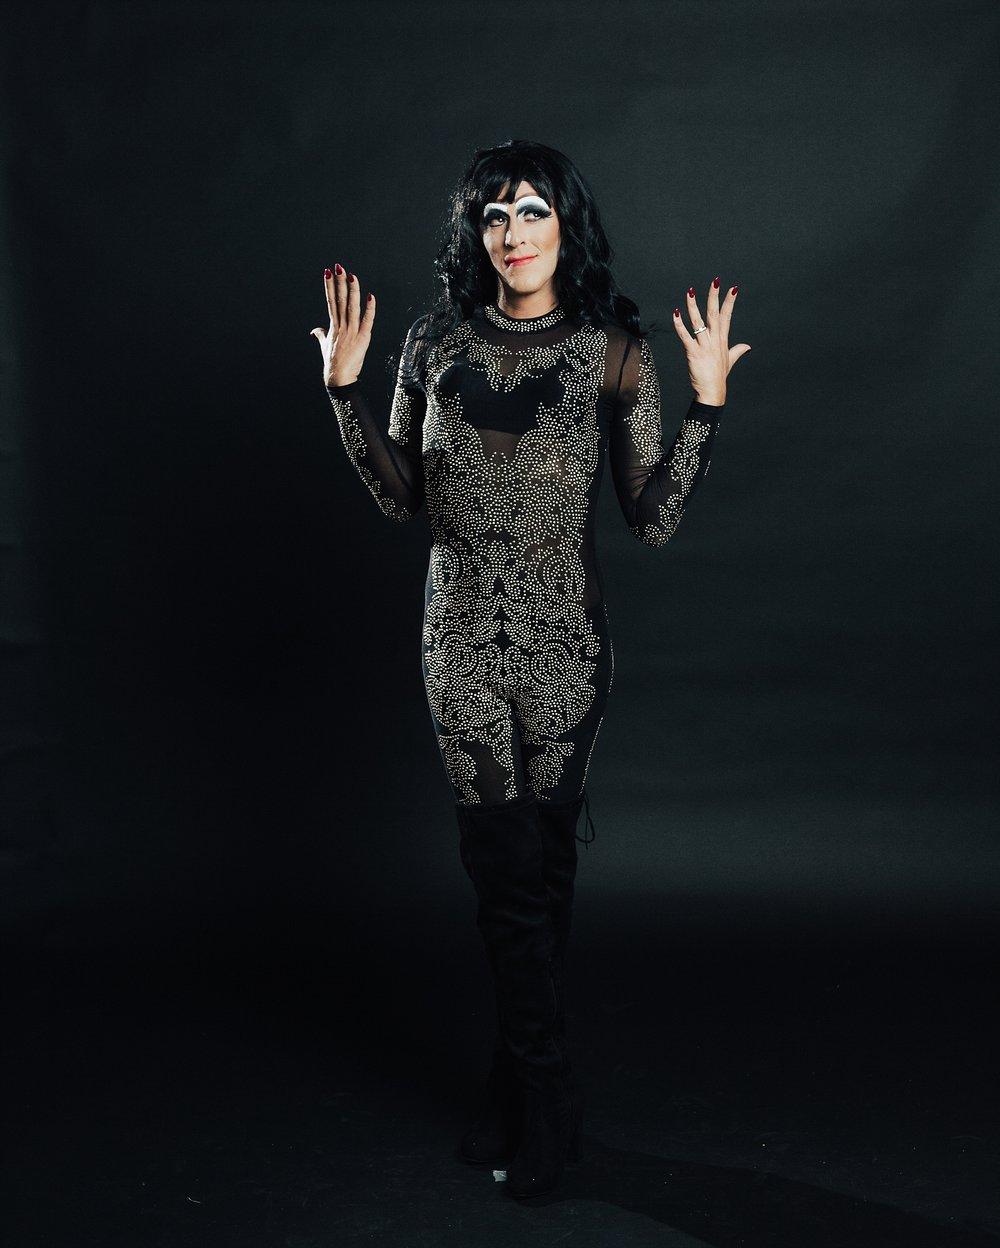 PGMC_Philadelphia_Gay_Mens_Chorus_Joe_Mac_Creative_LGBT_Photography_Voyeur_Gay_Philadelphia_0025.jpg